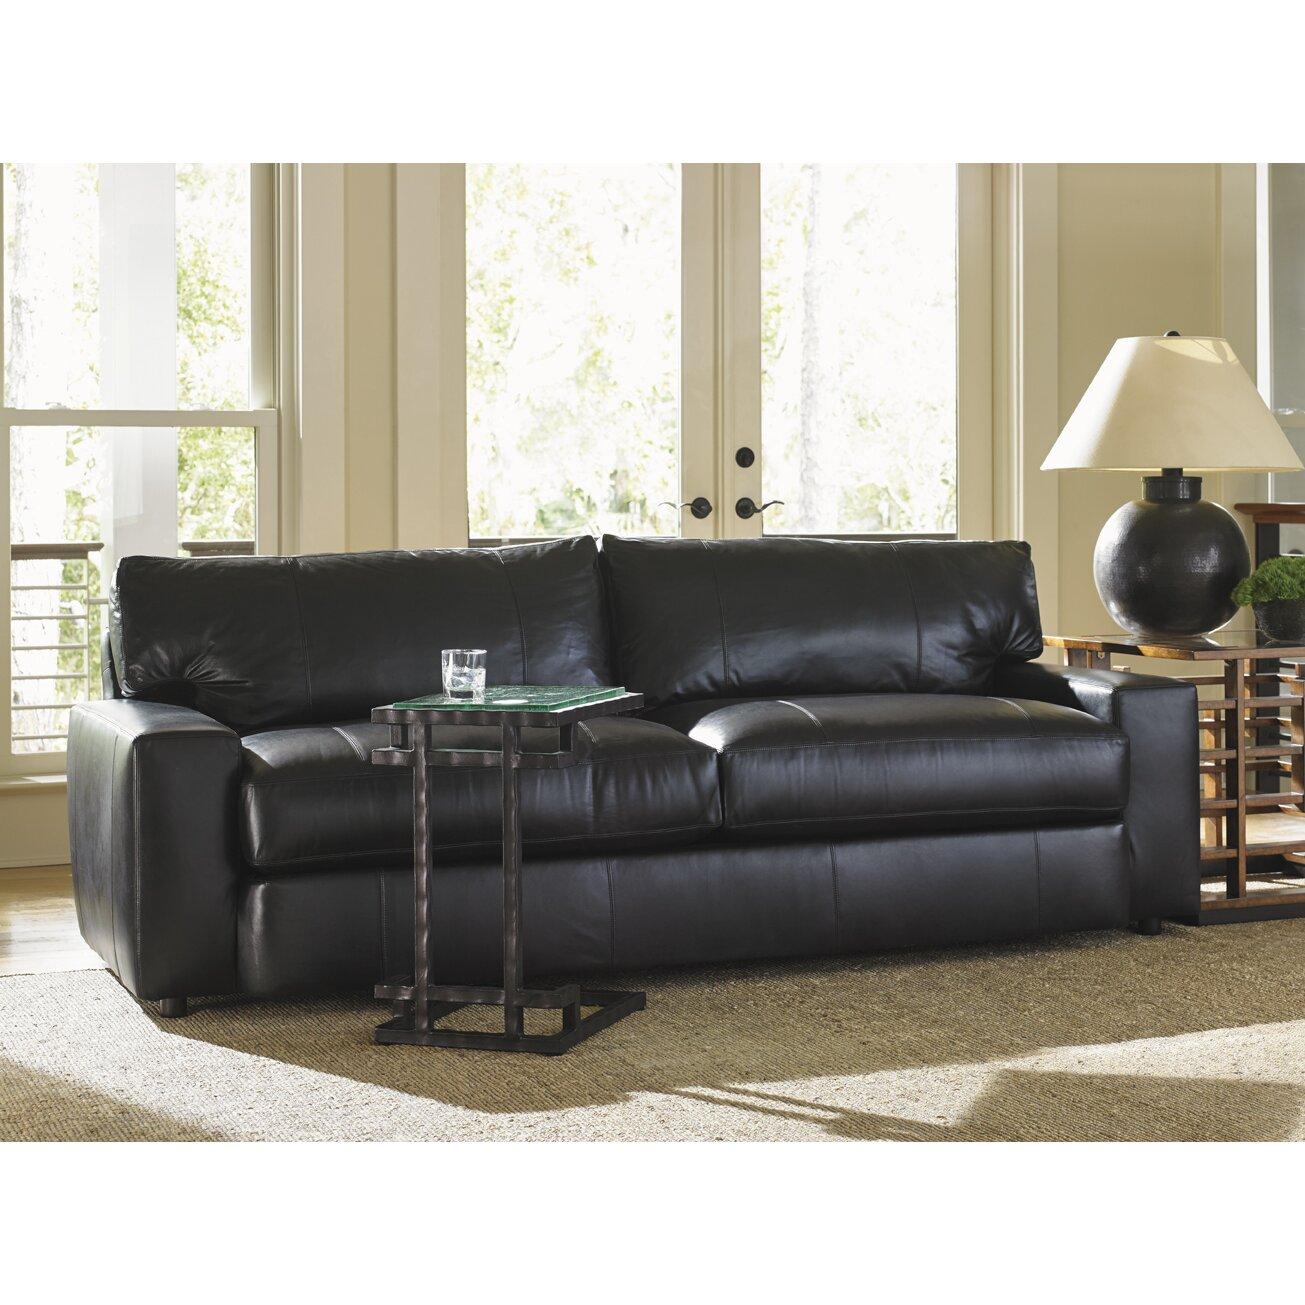 Island Fusion Sakura Leather Sofa - Tommy Bahama Home